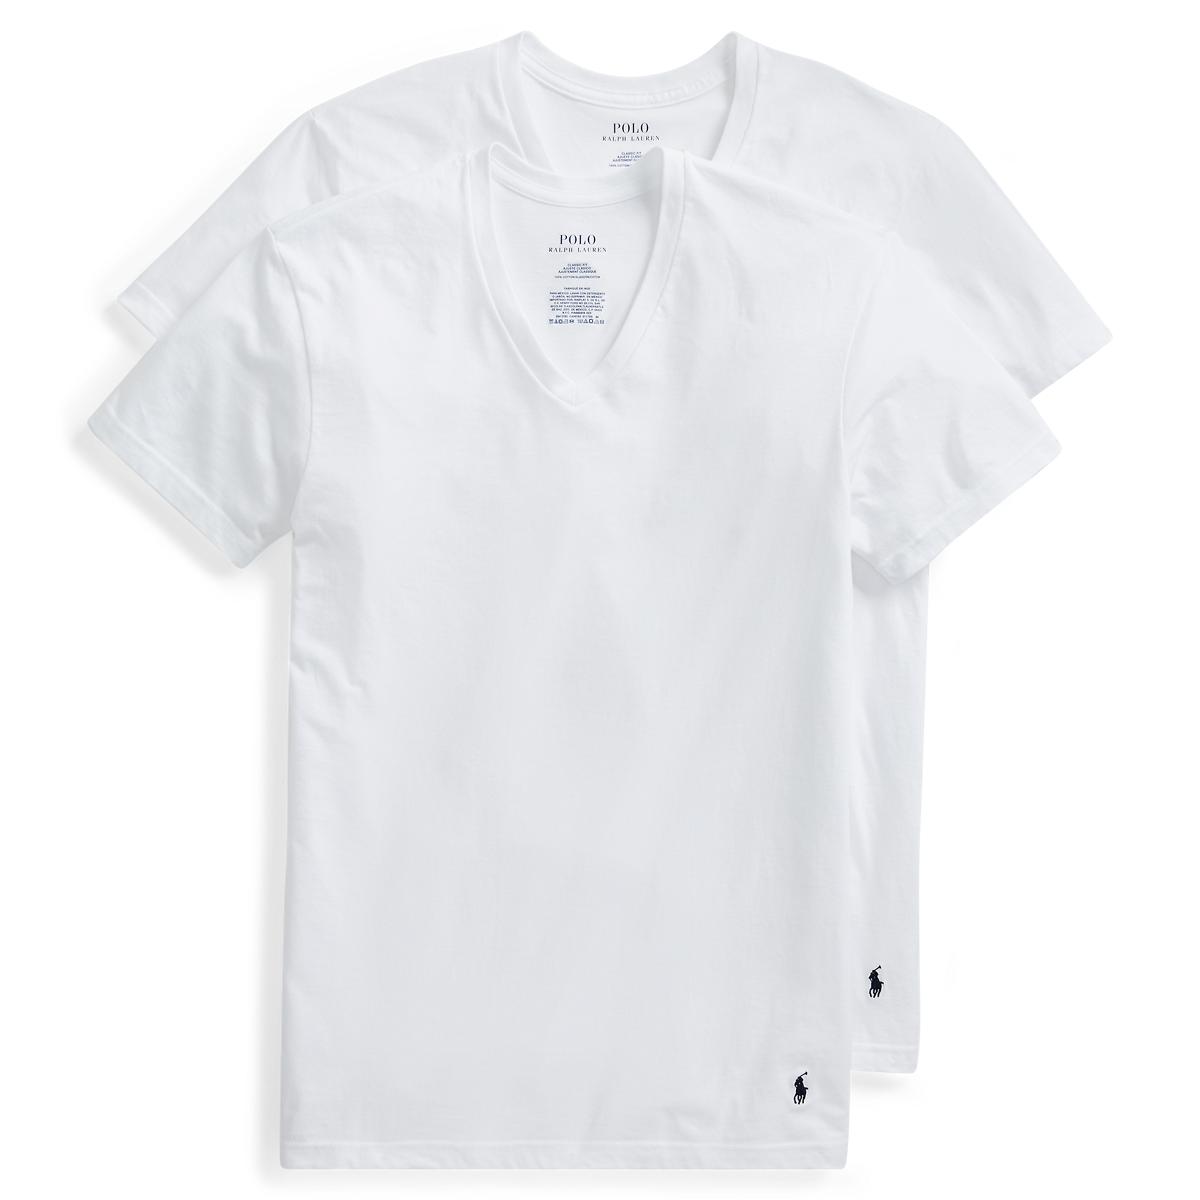 2ec851f6f76e Tall Classic V-Neck 2-Pack | Undershirts Underwear & Loungewear | Ralph  Lauren